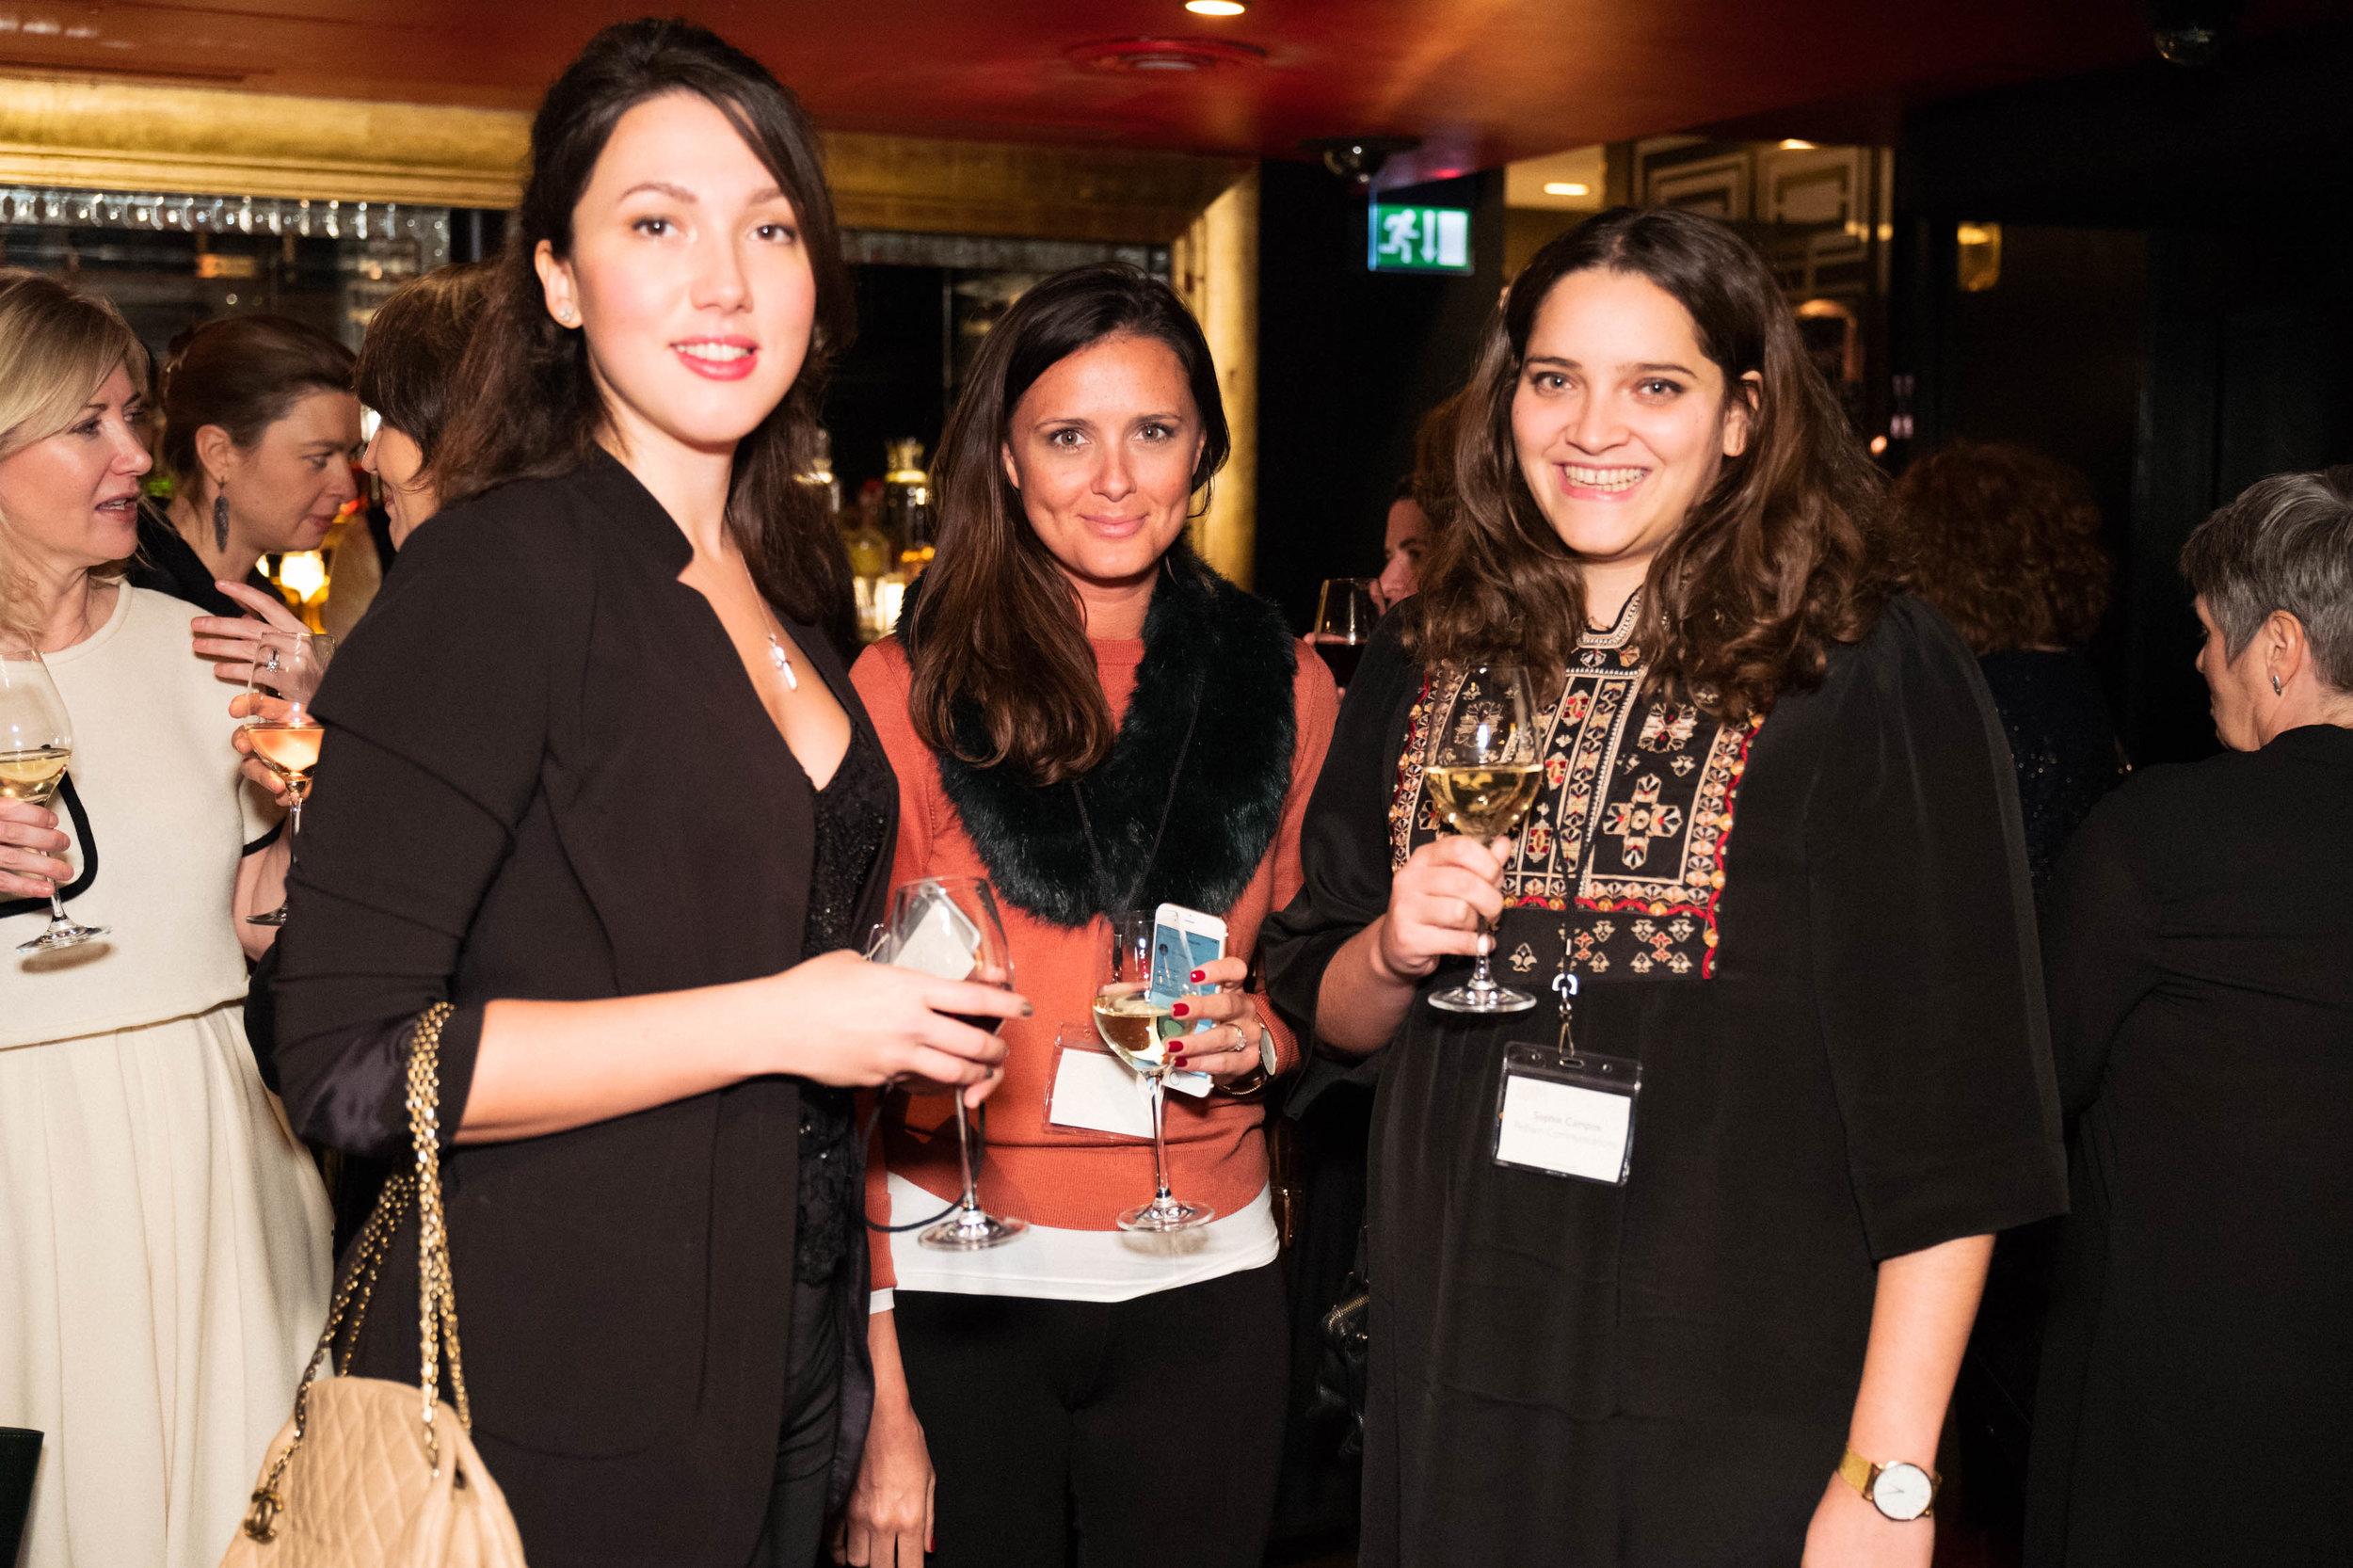 Anastasia Petrovskaya, Mary Agnew and Sophie de Gama Campos